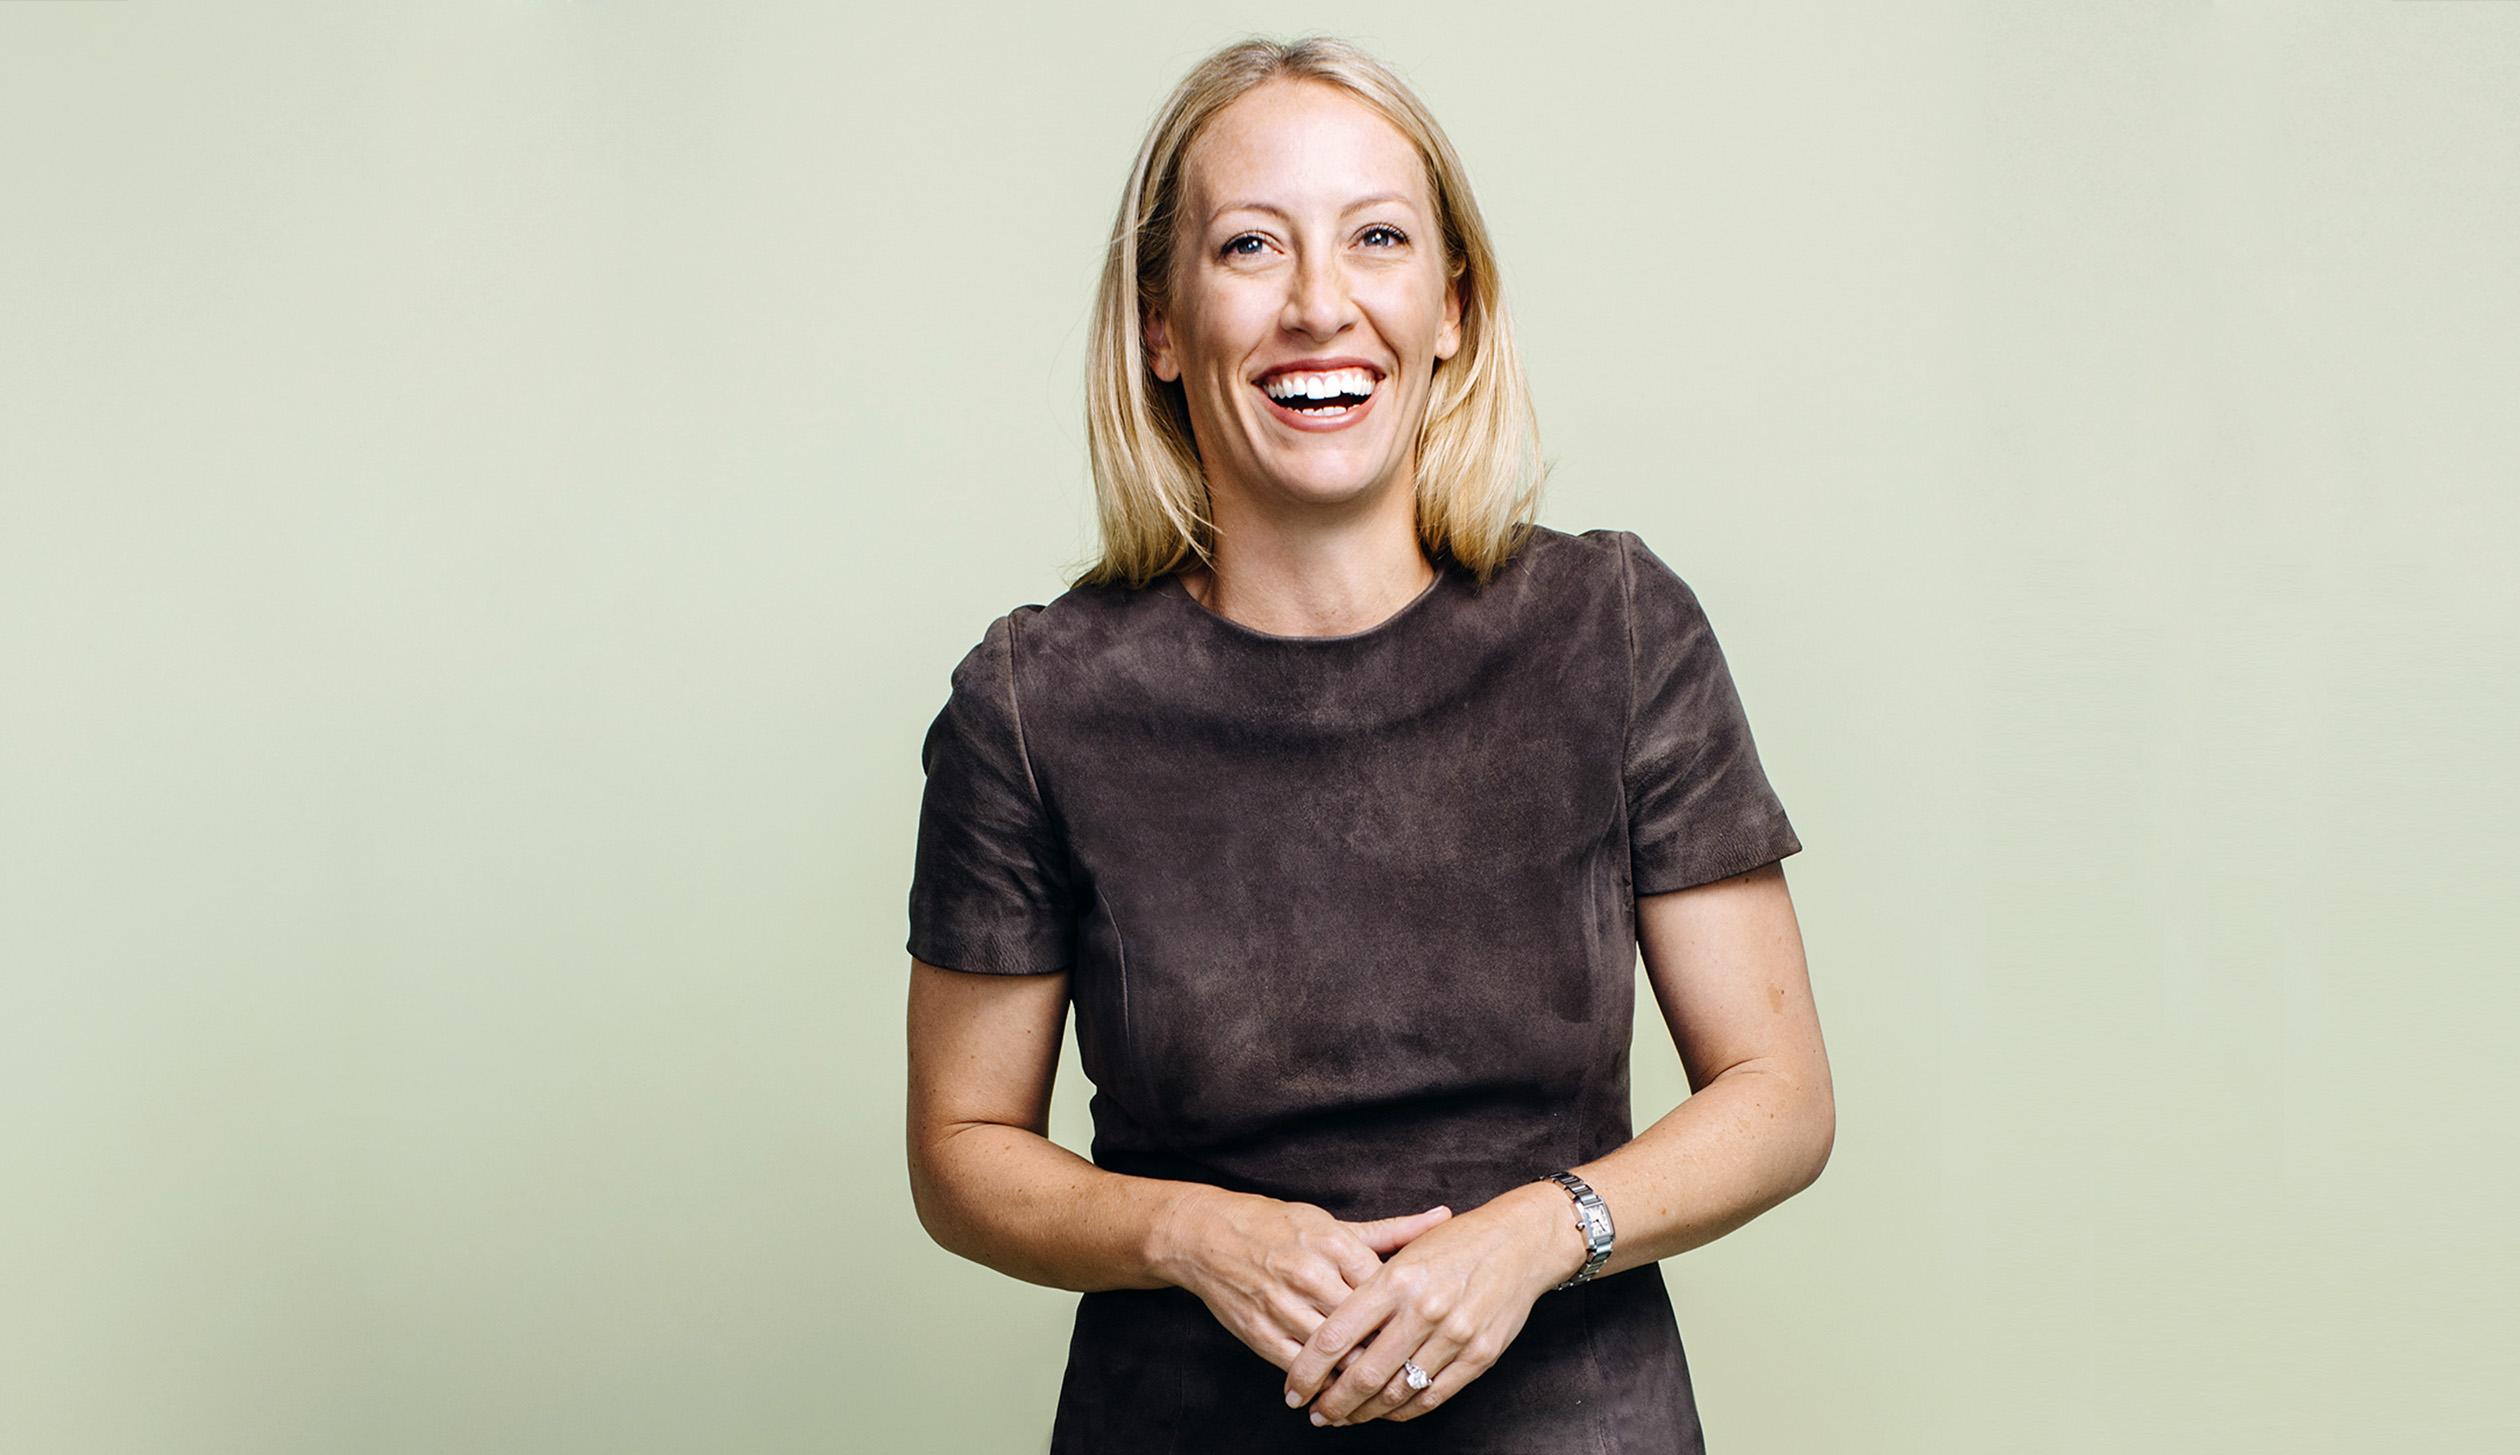 Julia Hartz, Forbes Magazine, October 4, 2016